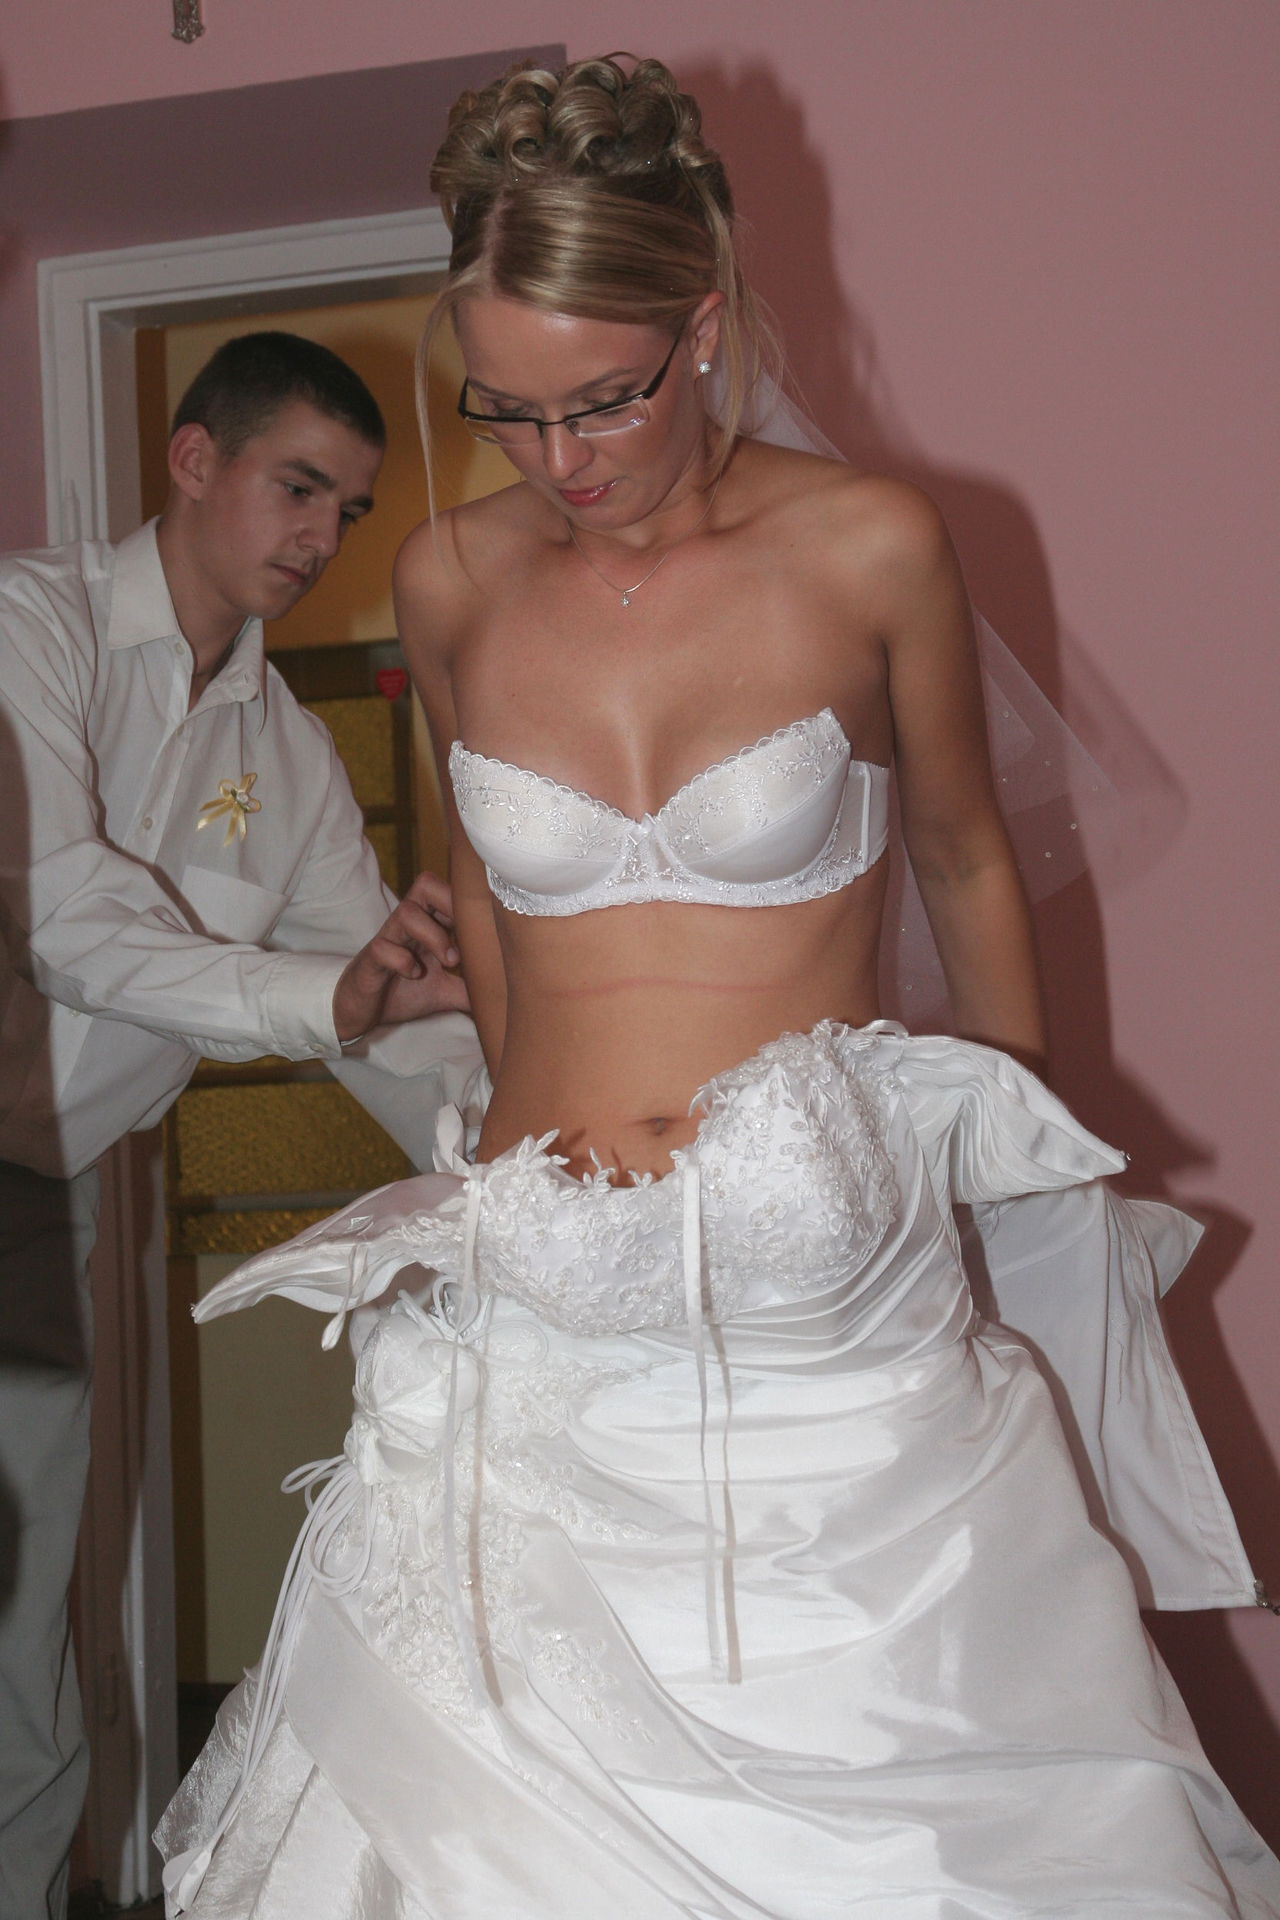 German Bitch fuck the Bridegroom